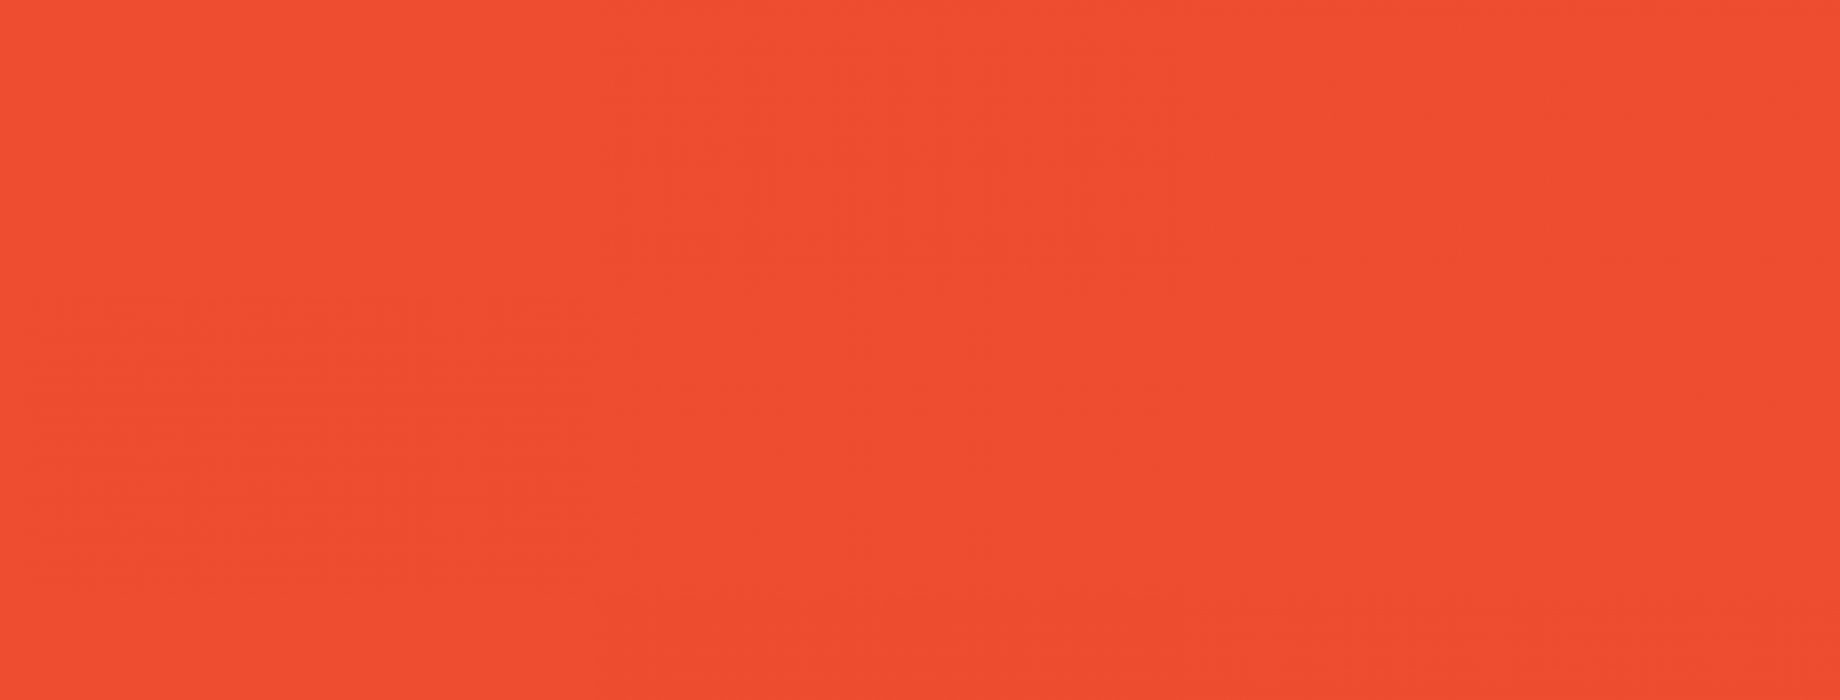 Solid Rectangle of Orange